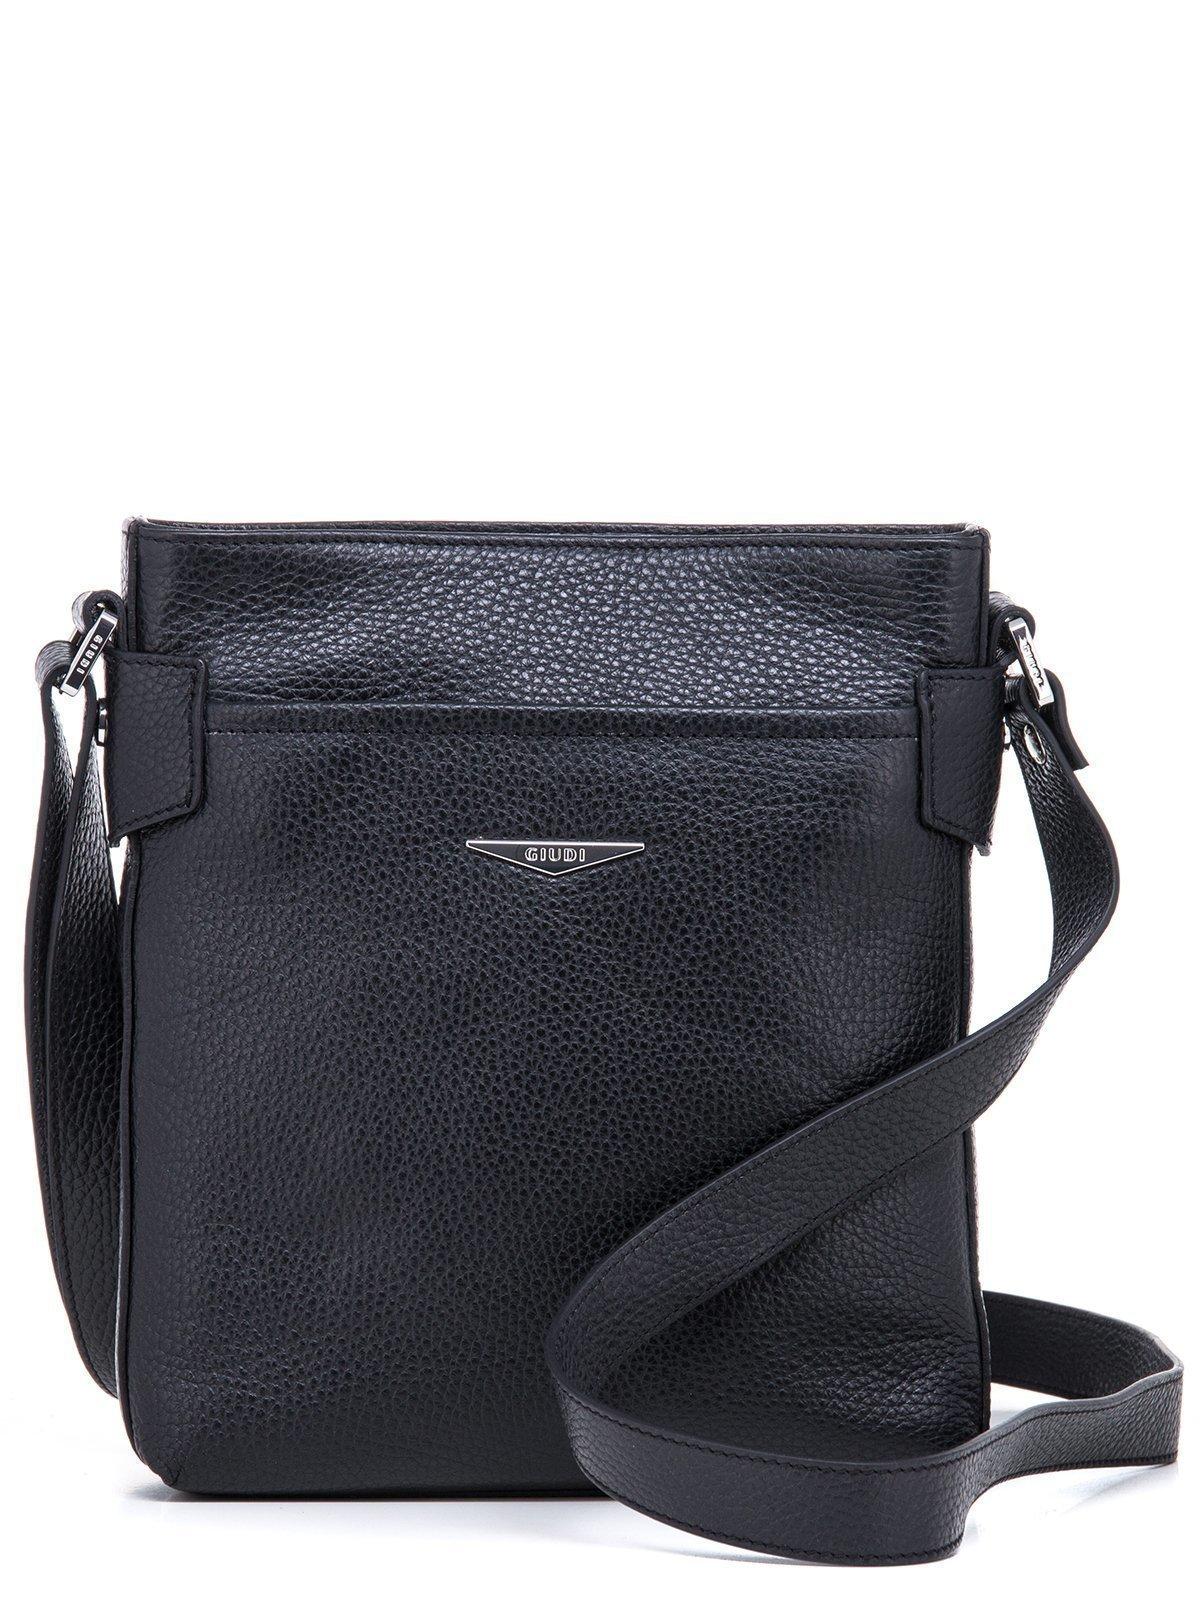 3eae0a073cbd Чёрная сумка планшет Giudi купить по цене 10490 руб. ☛ (артикул ...